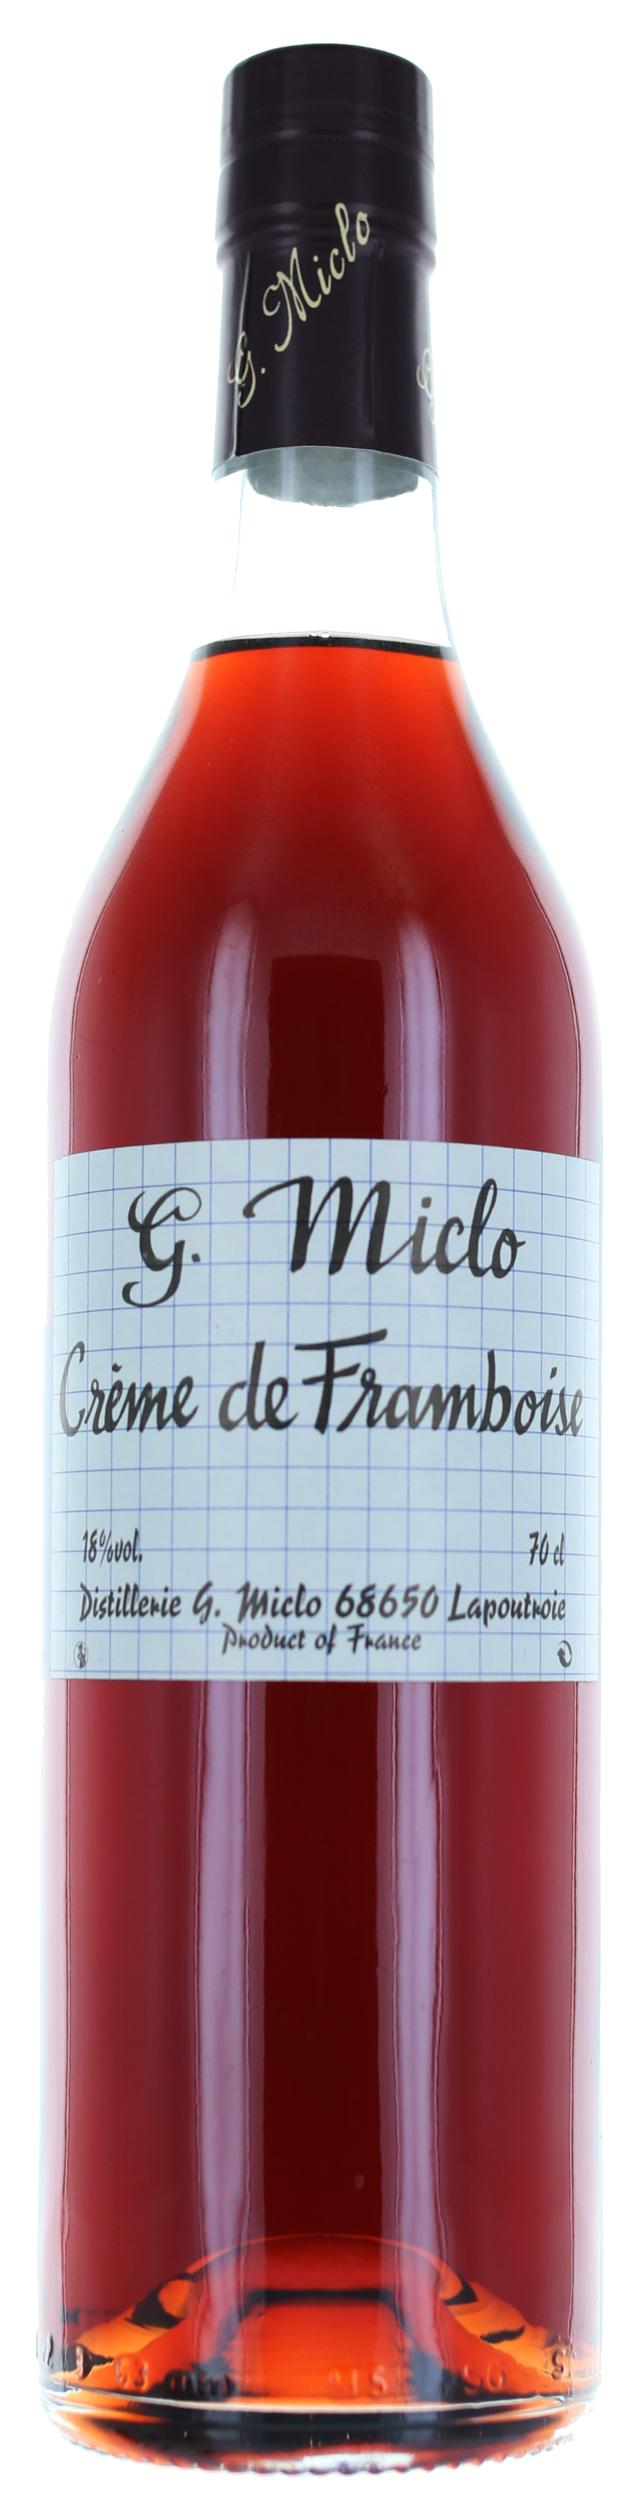 CREME DE FRAMBOISE - 18° - G. Miclo